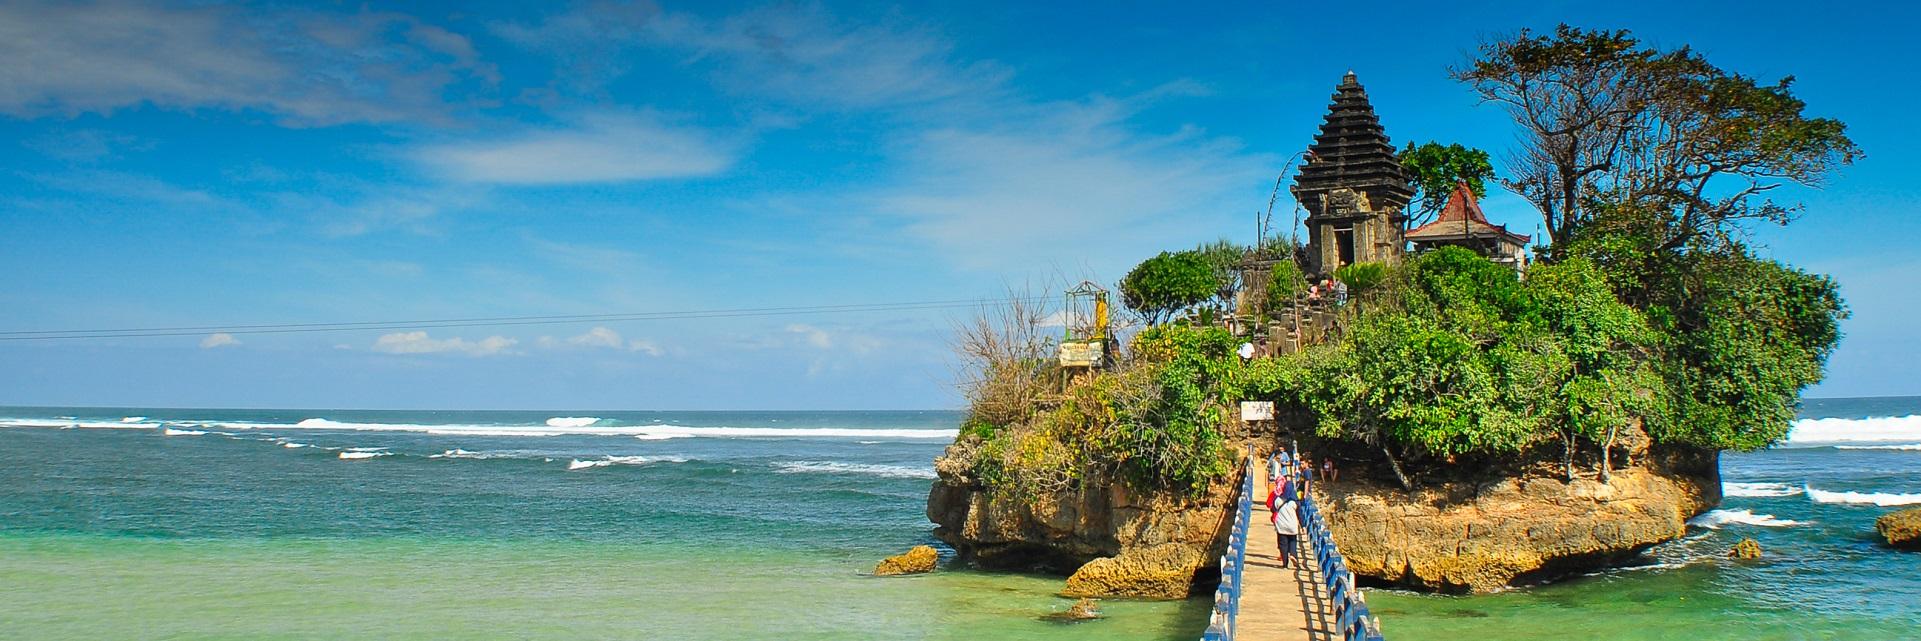 Pantai Balekambang, Pantai Balekambang Malang, Malang, Kabupaten Malang, Dolan Dolen, Dolaners Pantai Balekambang via Mohamad Sofiudin - Dolan Dolen